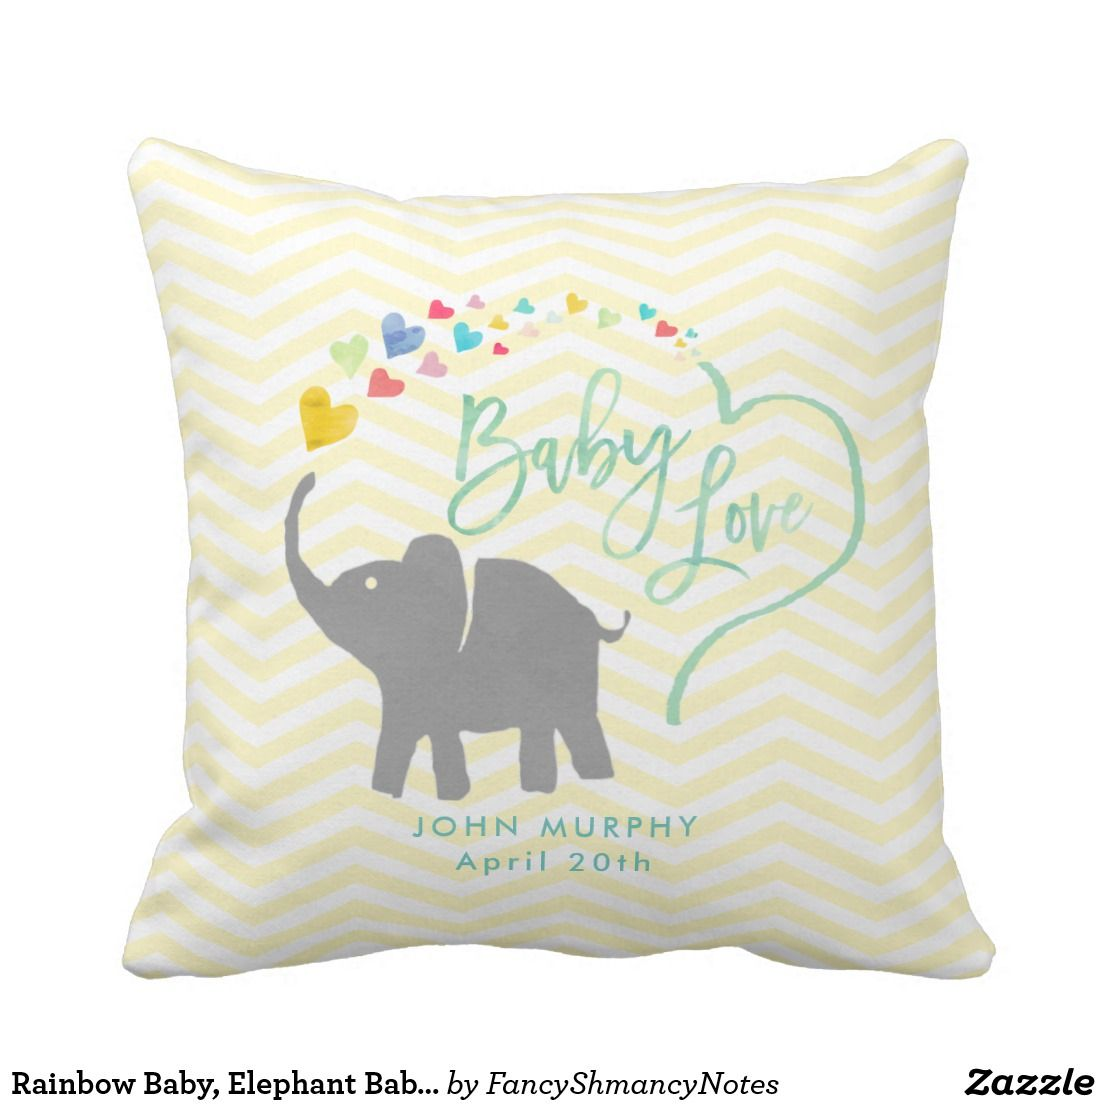 Rainbow Baby, Elephant Baby Love Throw Pillow